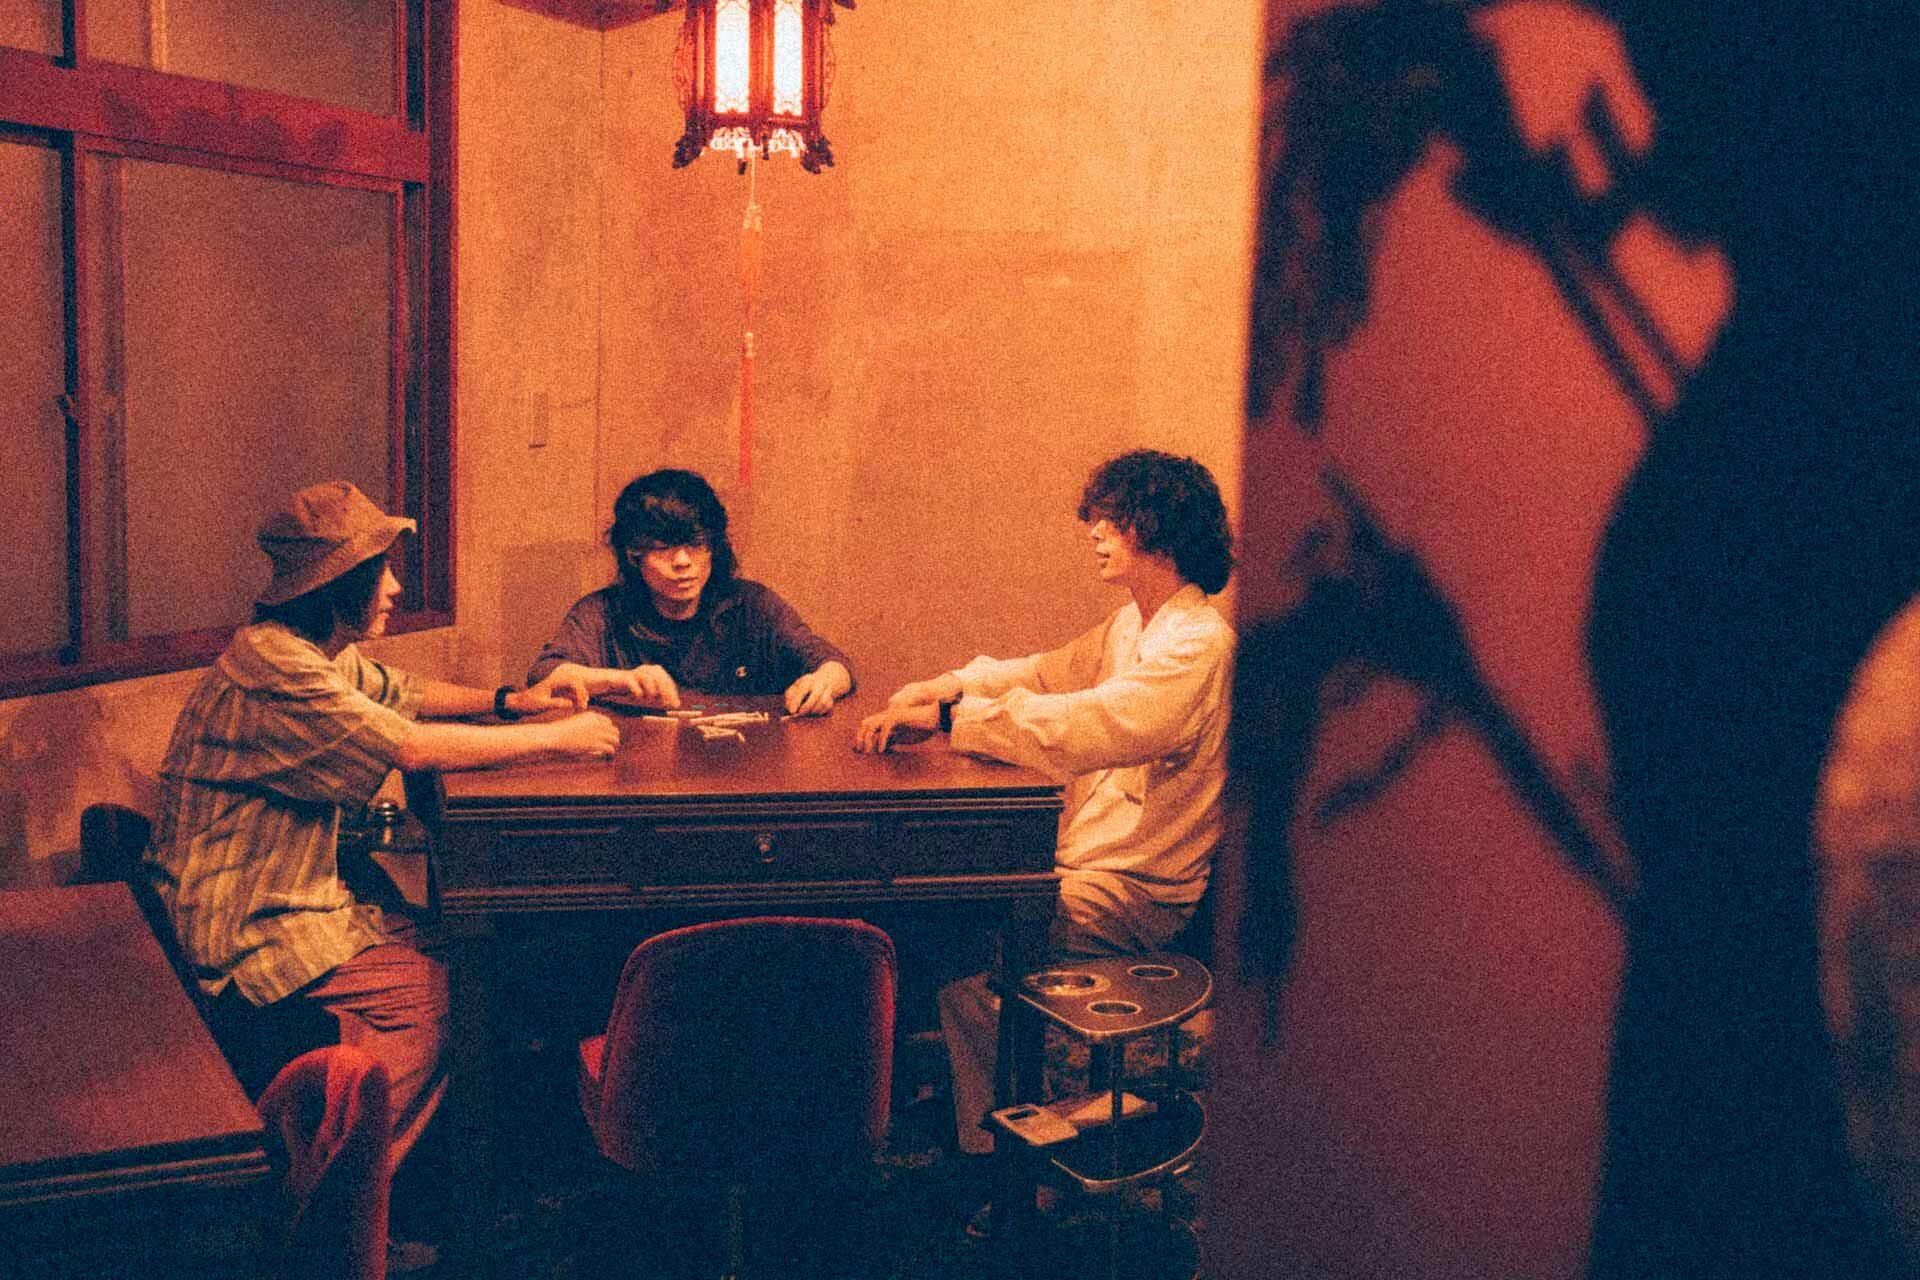 Tempalay × ドミコ × MONO NO AWARE「中国巡演」鼎談|盟友となった中国ツアーを振り返る interview1007_chinatour-0764